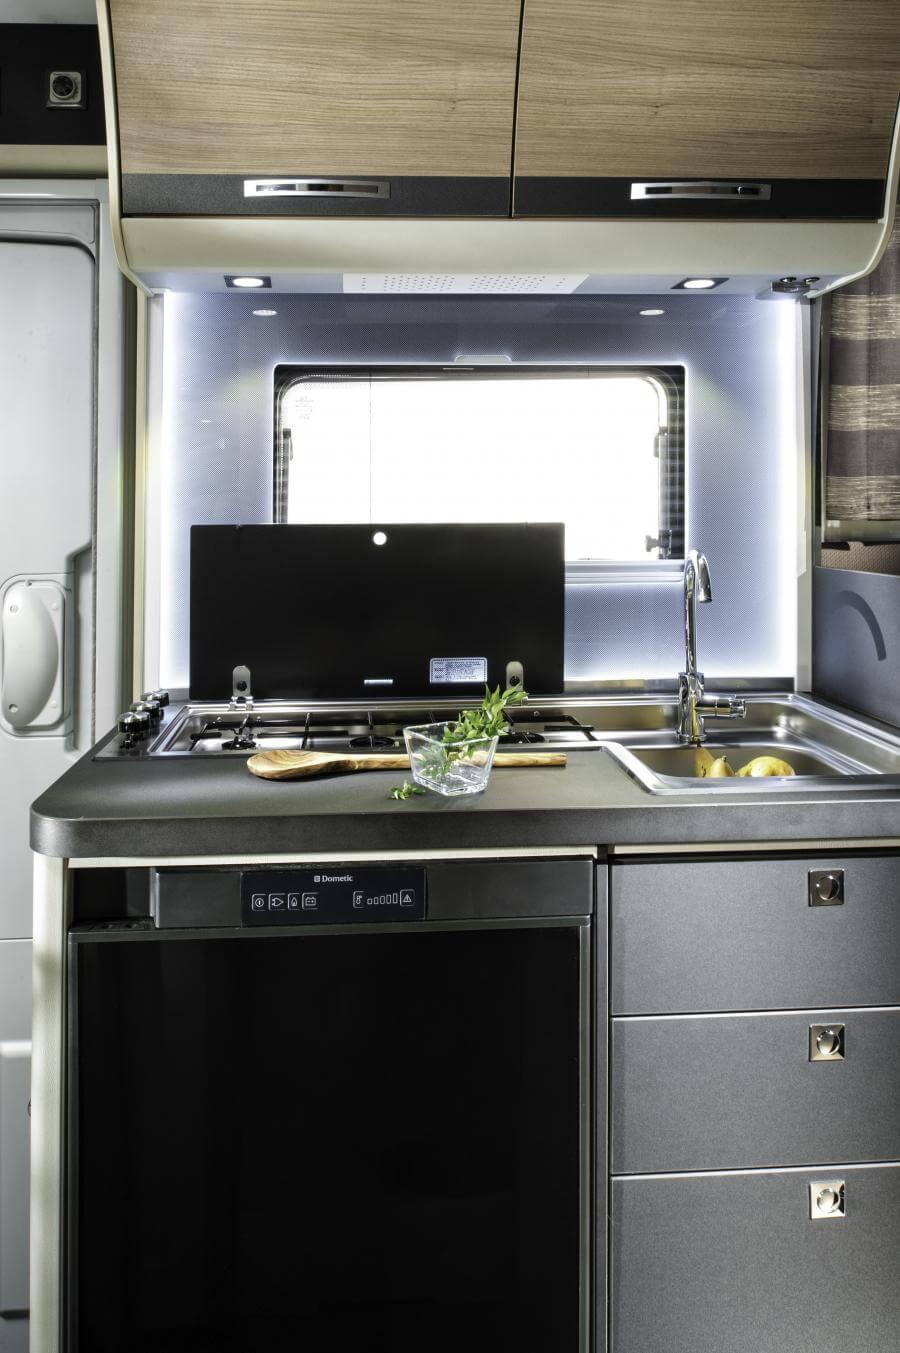 No 12. 5005 Compact Sl Kitchen Jmf 8695